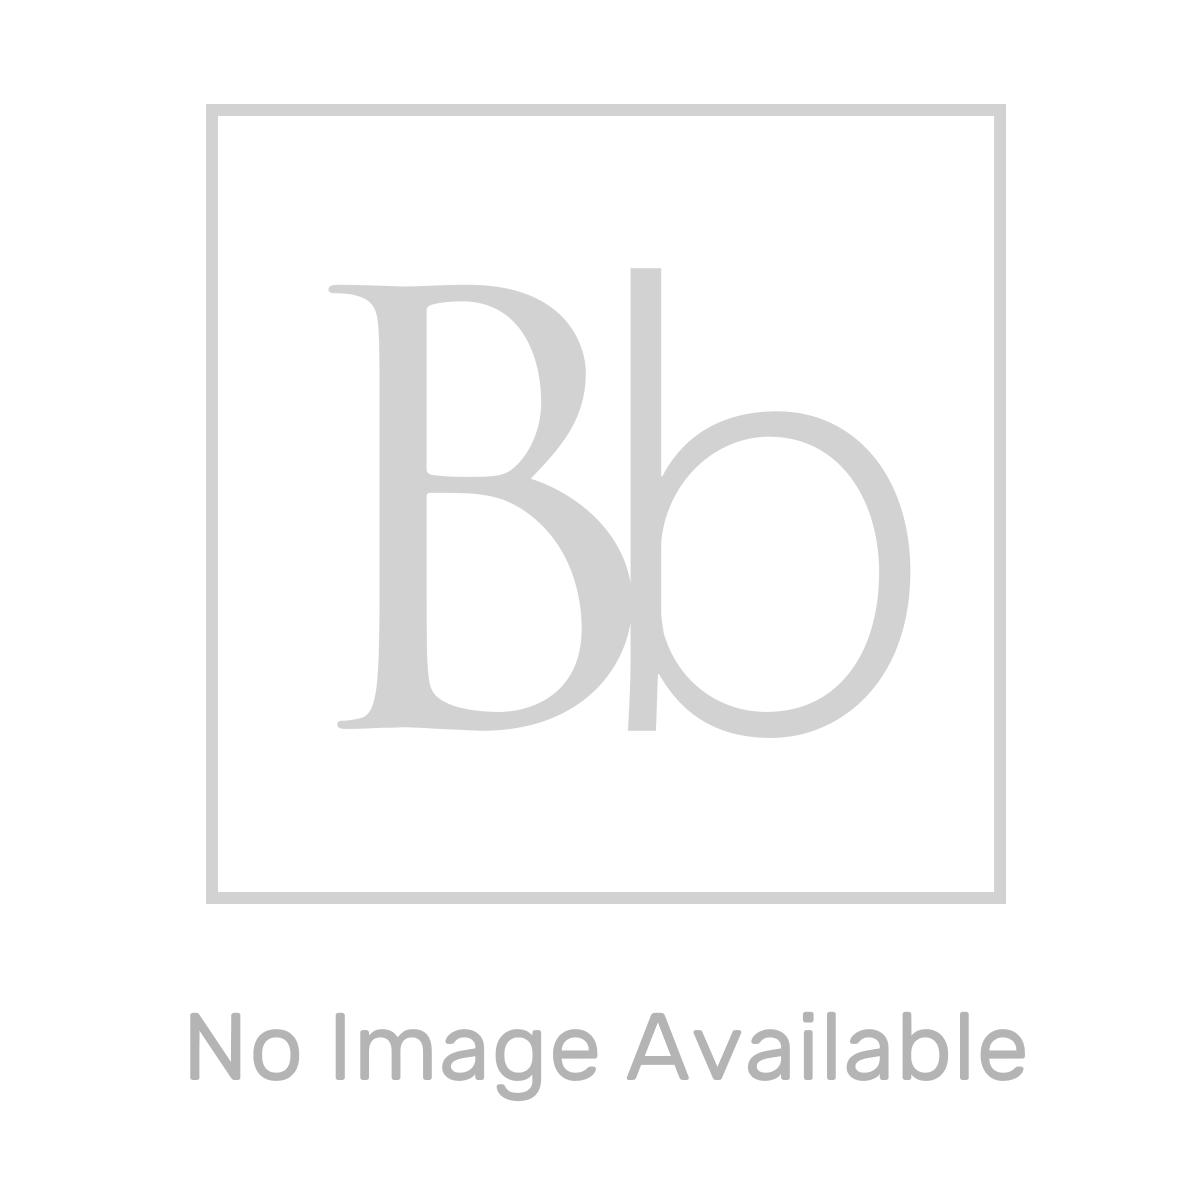 Frontline Standard Rectanglular Shower Tray 900 x 760mm